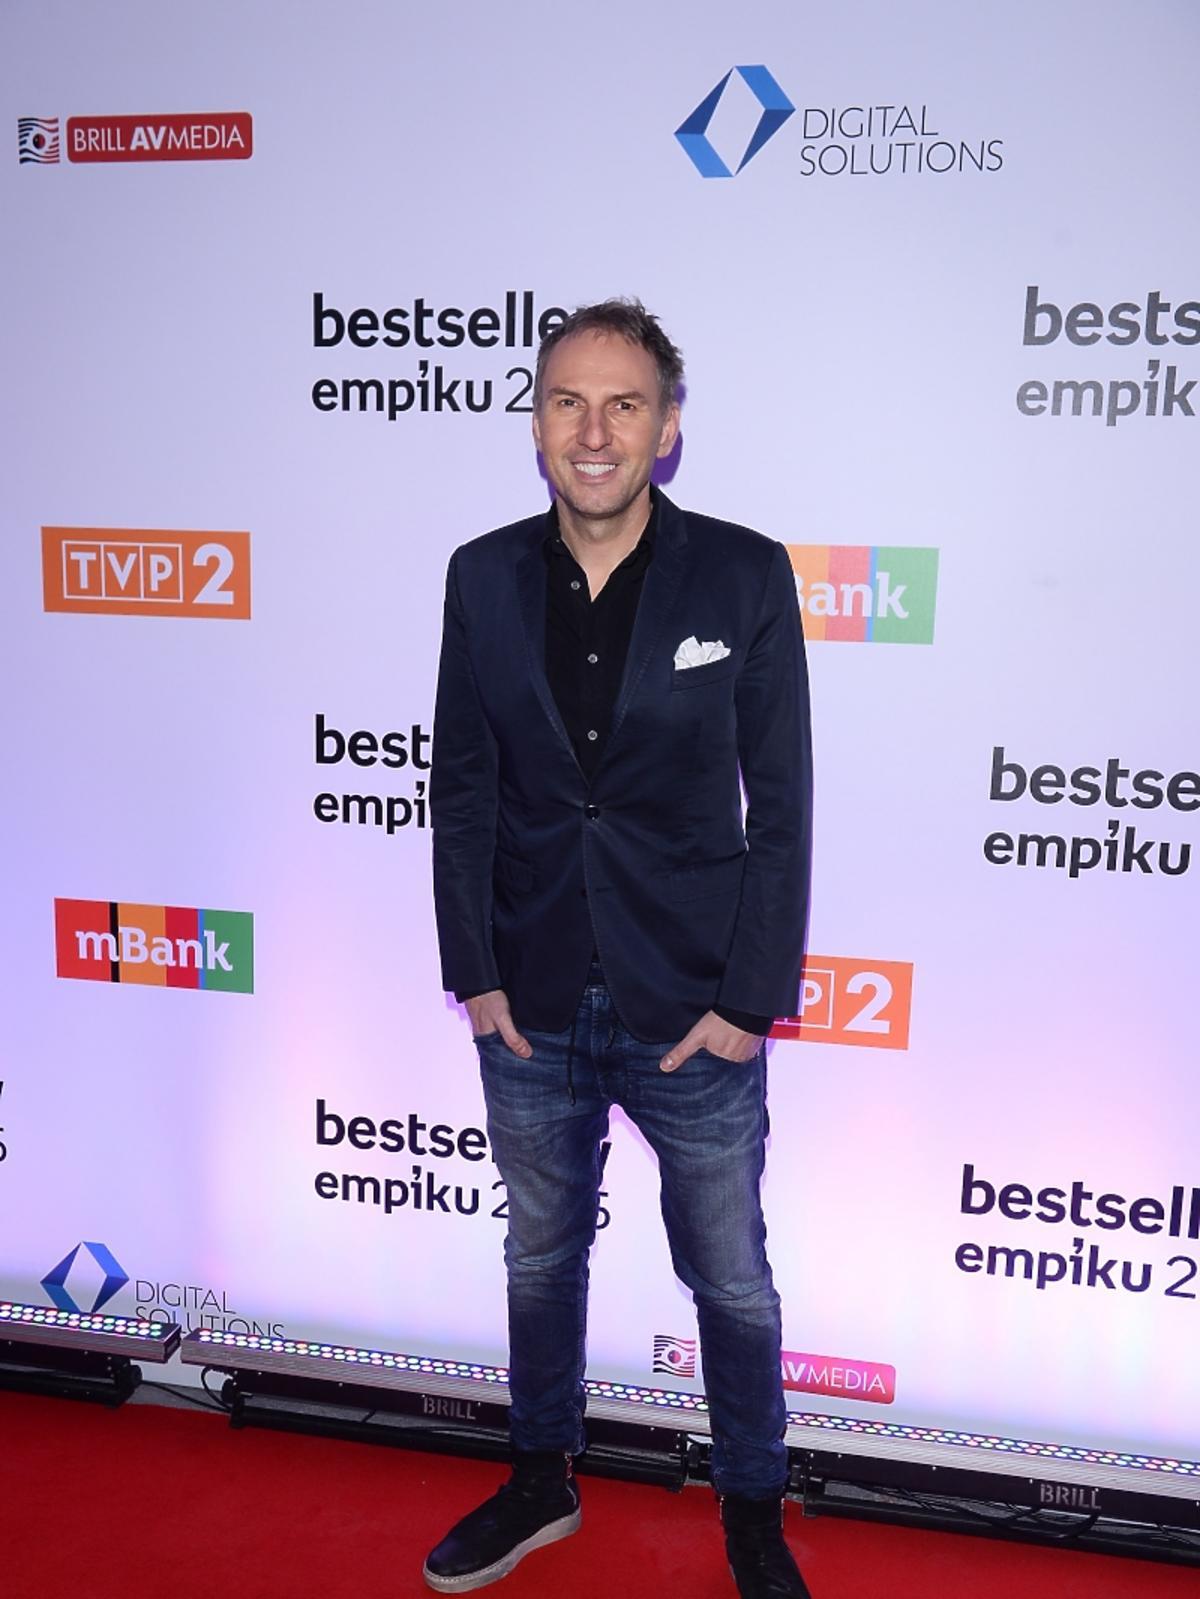 Krzysztof Gojdź na gali Bestsellery Empiku 2015